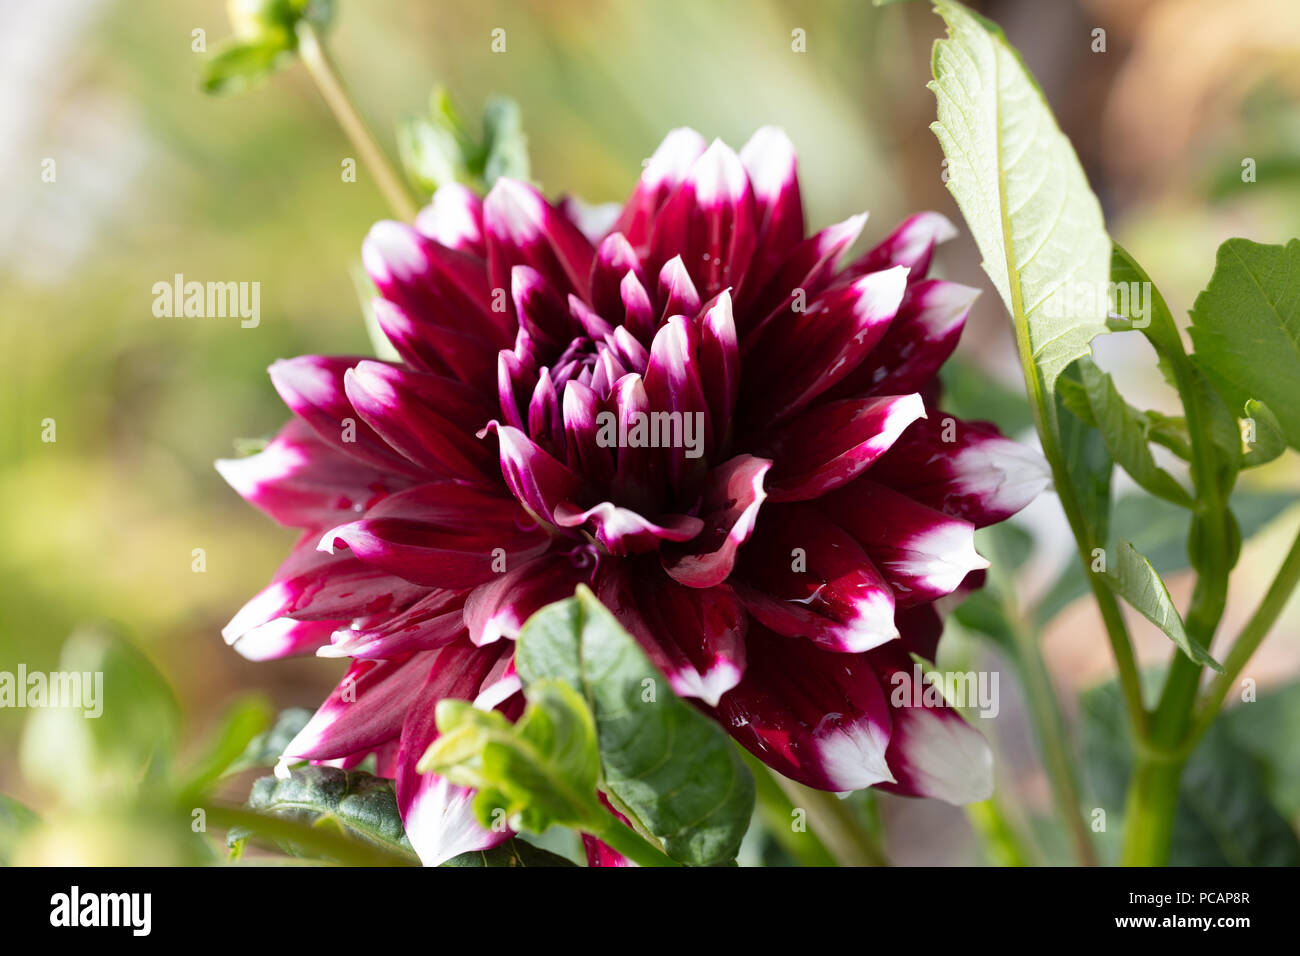 'Duet' Formal Decorative Dahlia, Dekorativdahlia (Dahlia x pinnata) - Stock Image